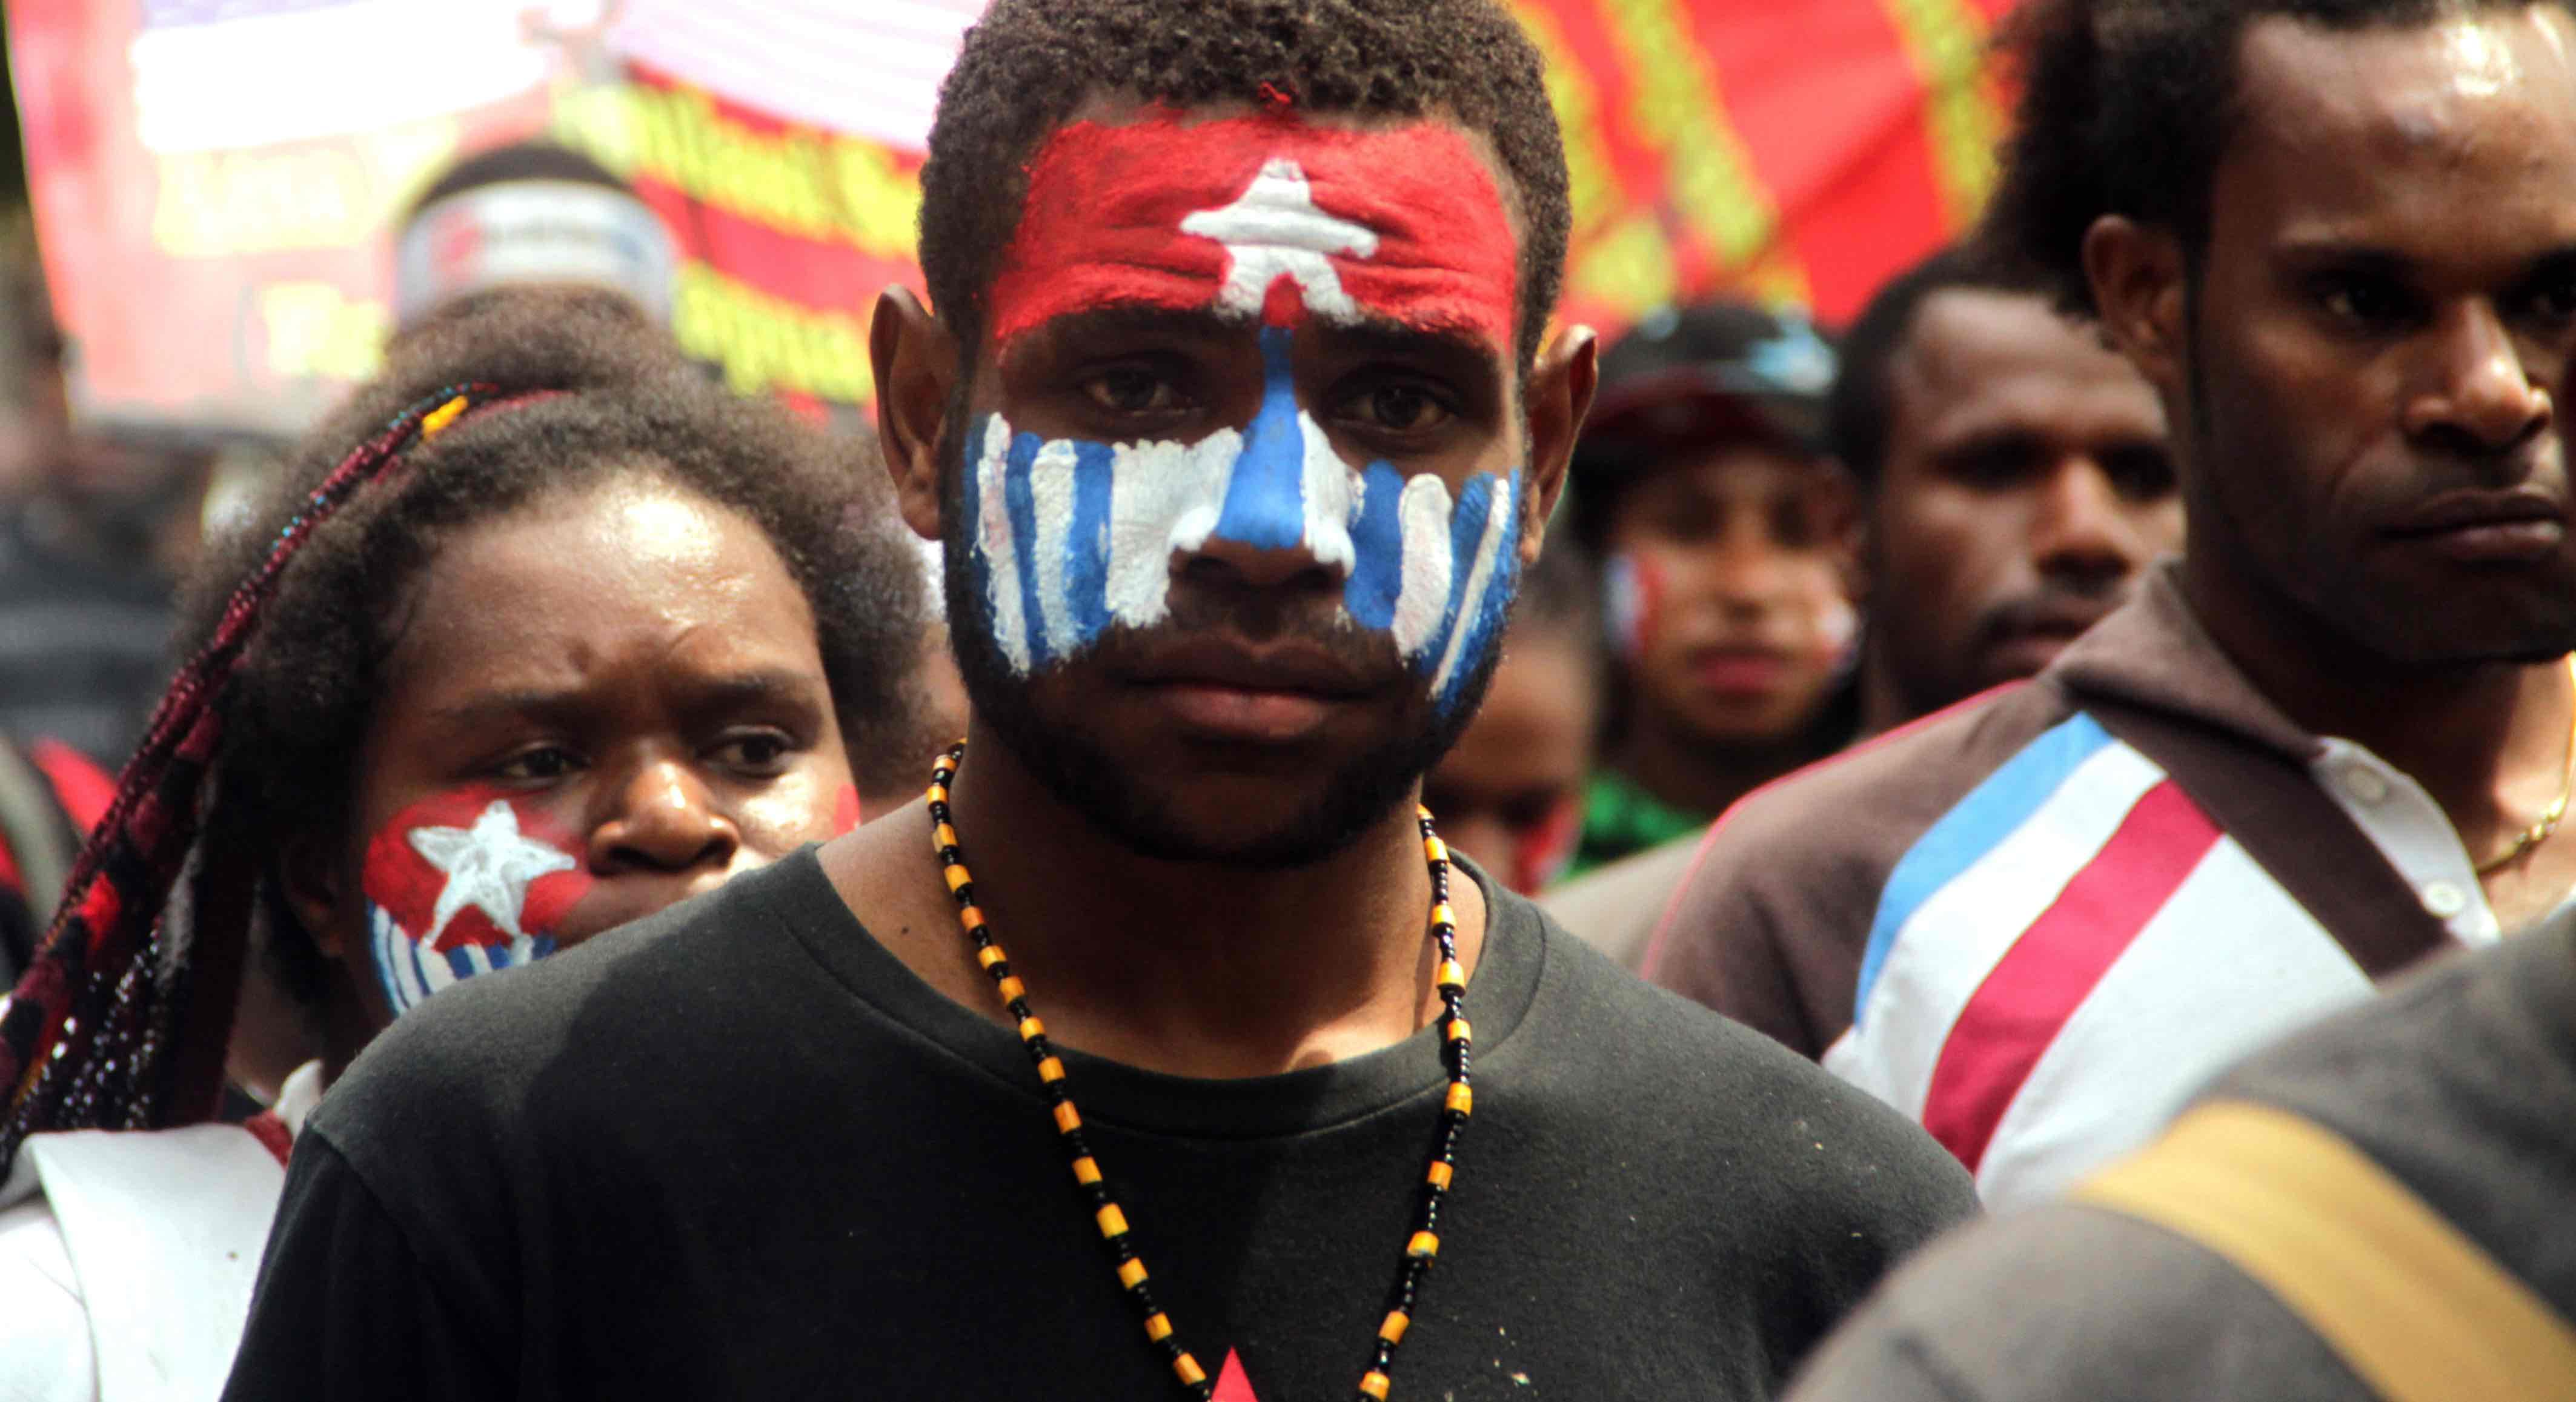 Students from the West Papua, Papua Student Alliance (AMP) demonstrate in Yogyakarta, Indonesia in 2014 (Photo: Slamet Riyadi/Getty)